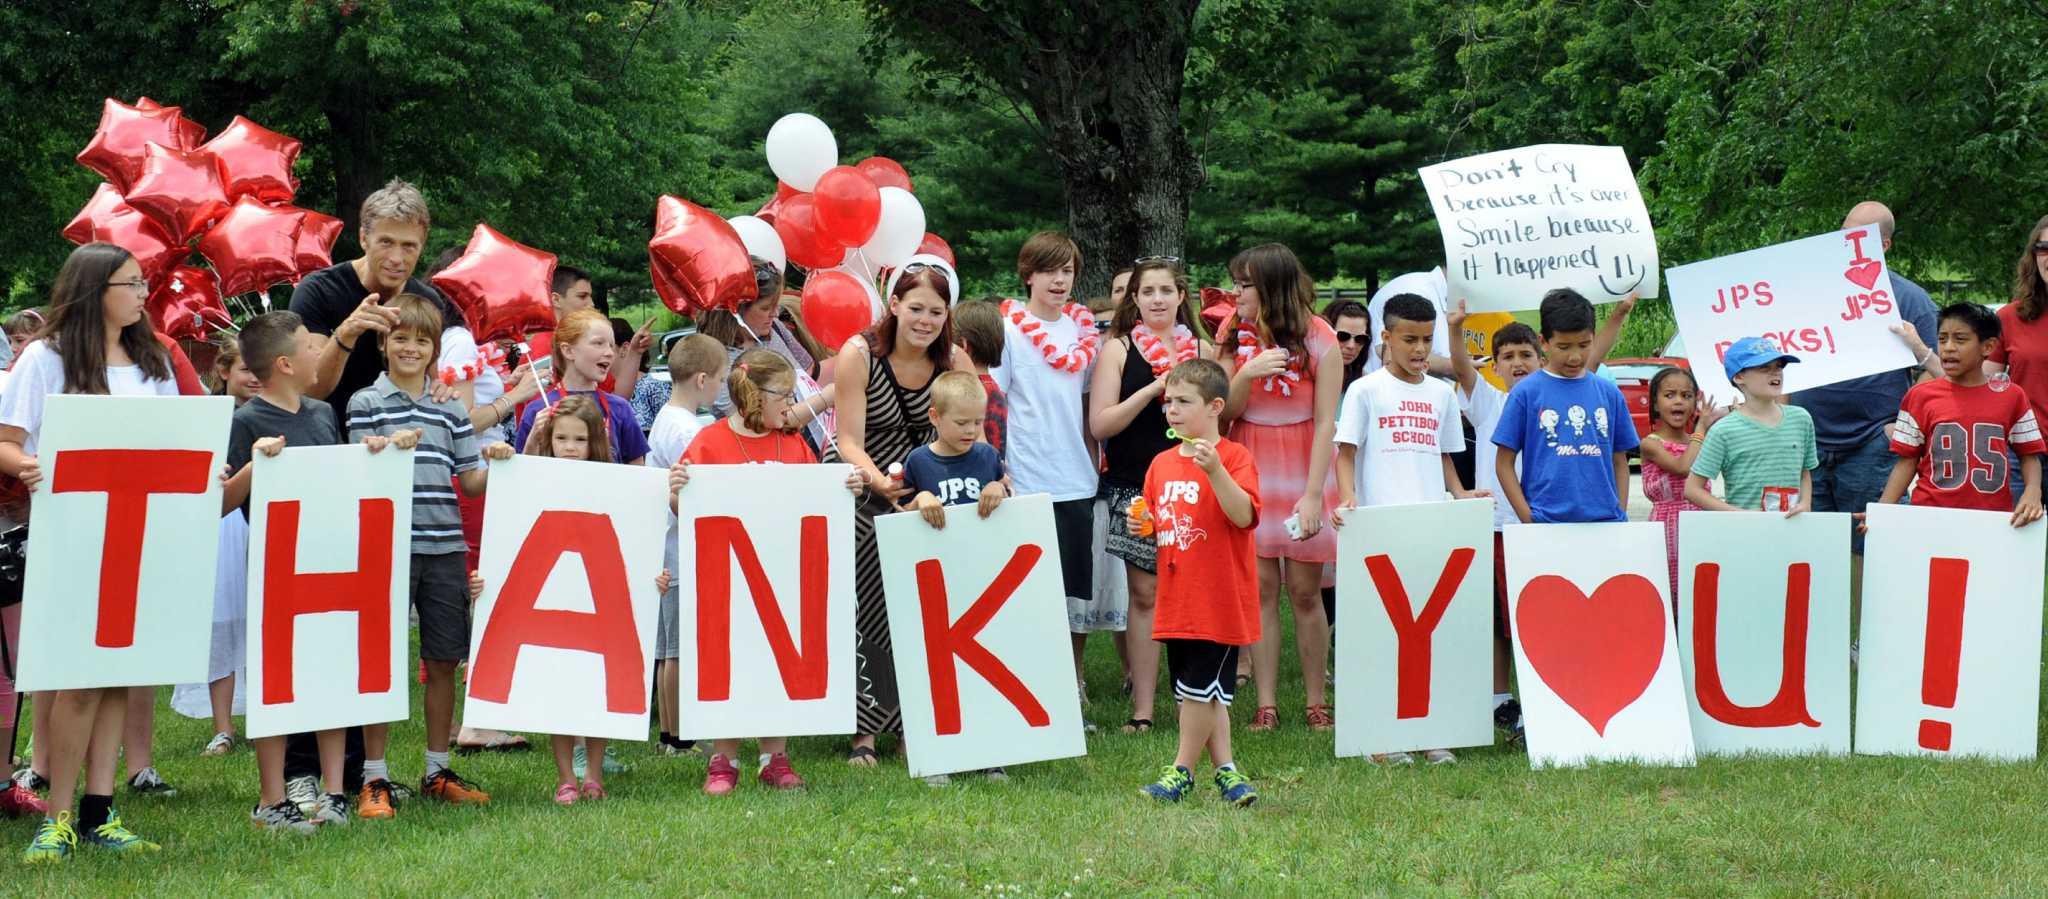 New Milford school's closing brings wave of emotions - NewsTimes